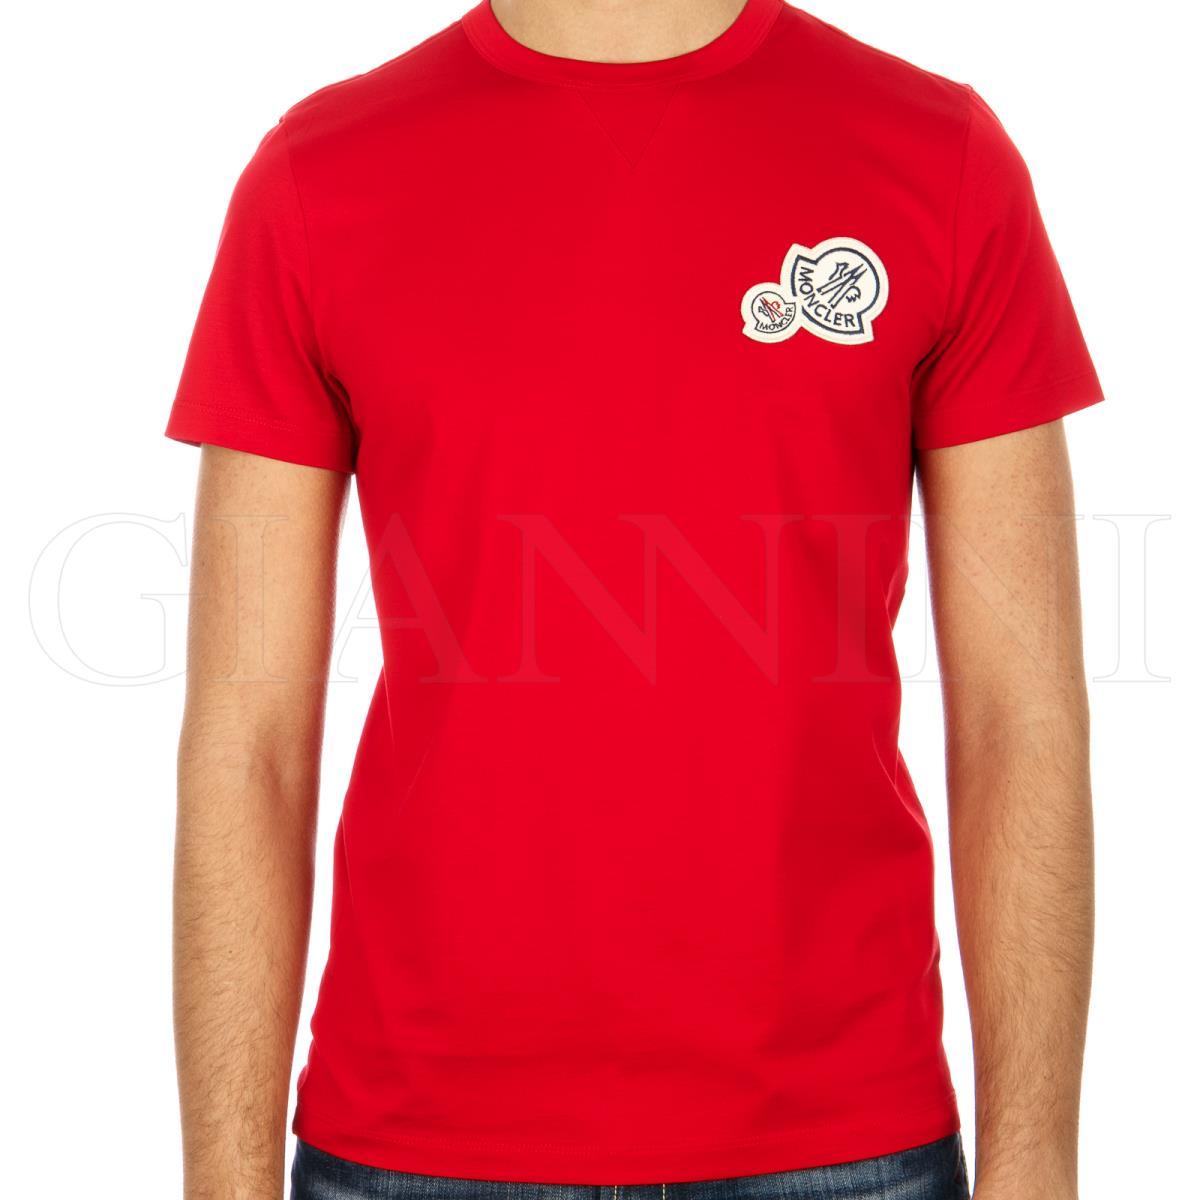 moncler maglietta